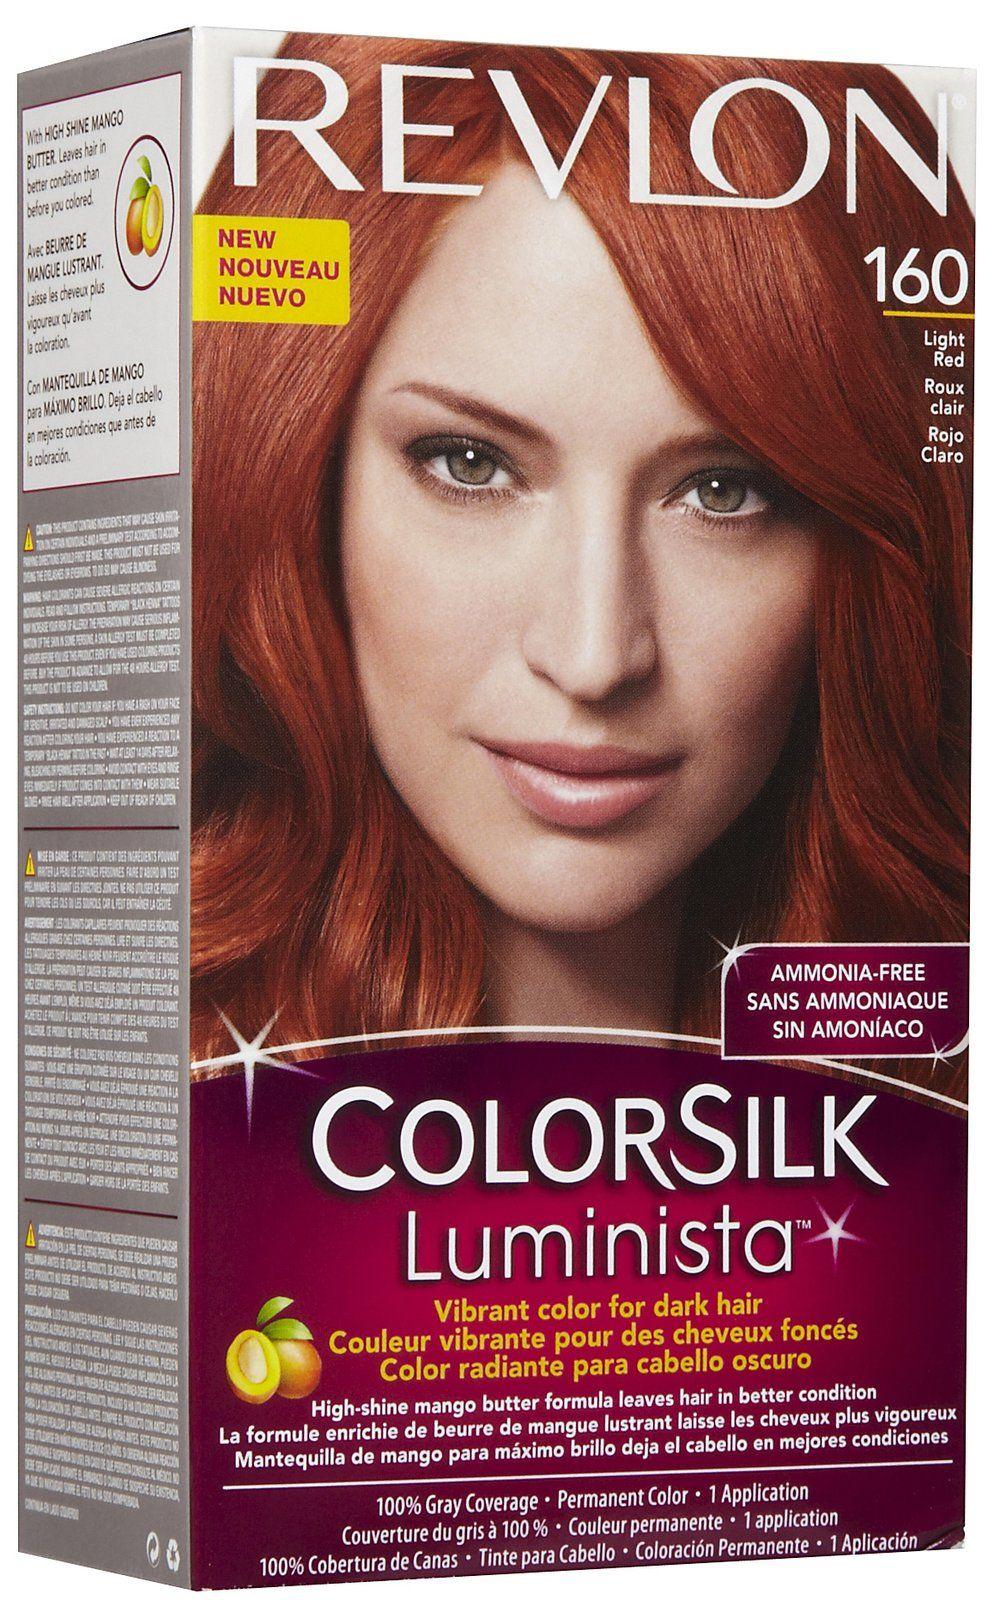 Revlon Reddish Brown Hairstyle Inspirations 2018